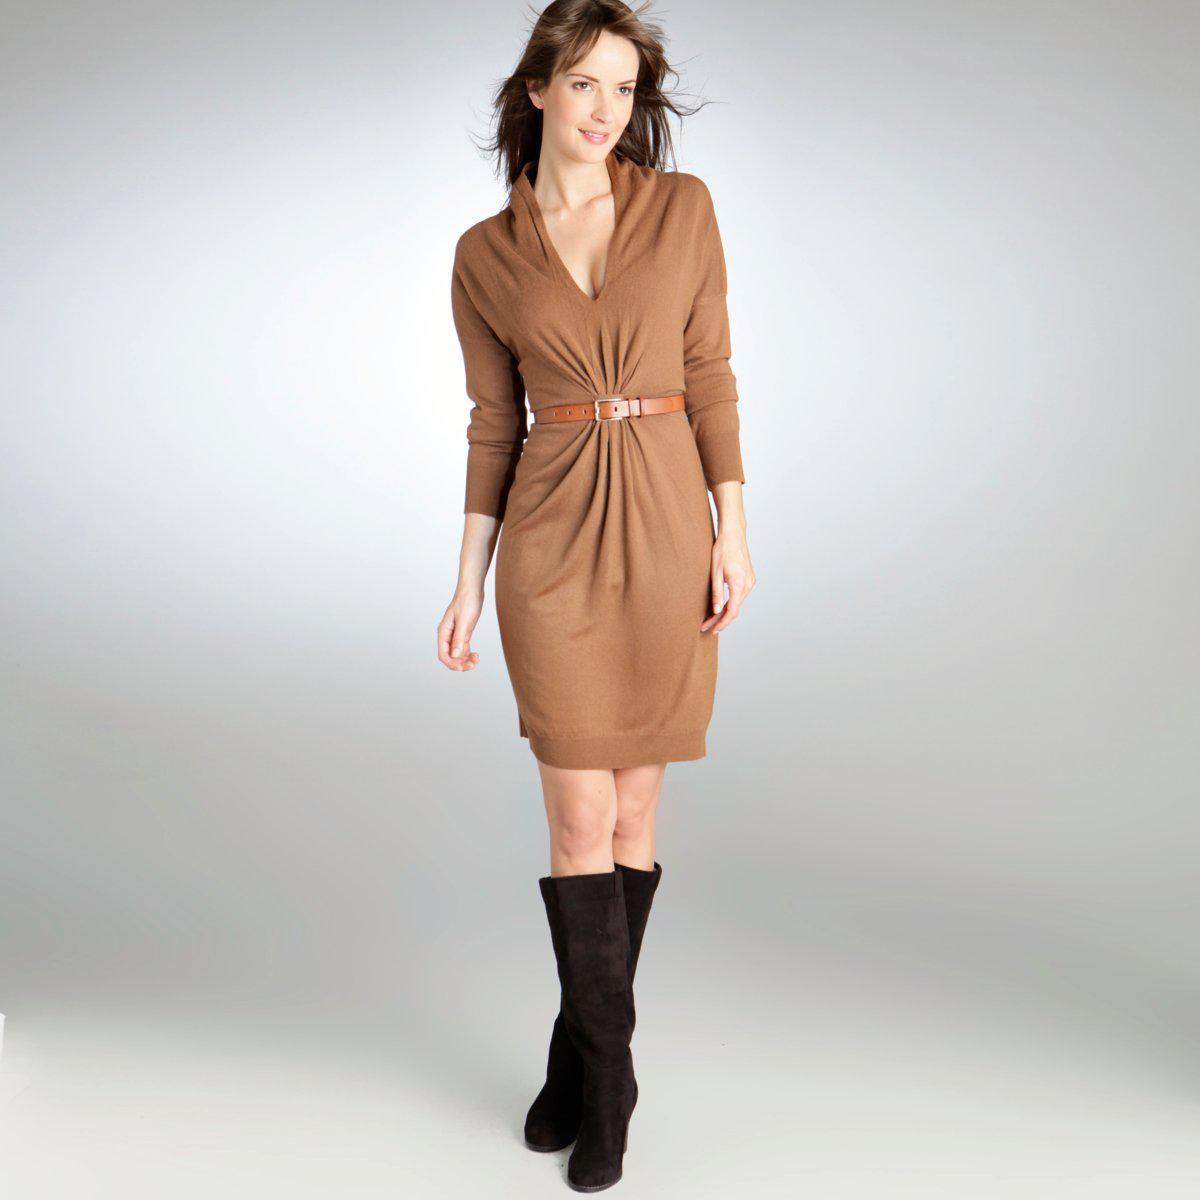 bradyna foremata 245 - Βραδυνα Φορεματα LaRedoute Φθινόπωρο 2011 Κωδ. 324212935